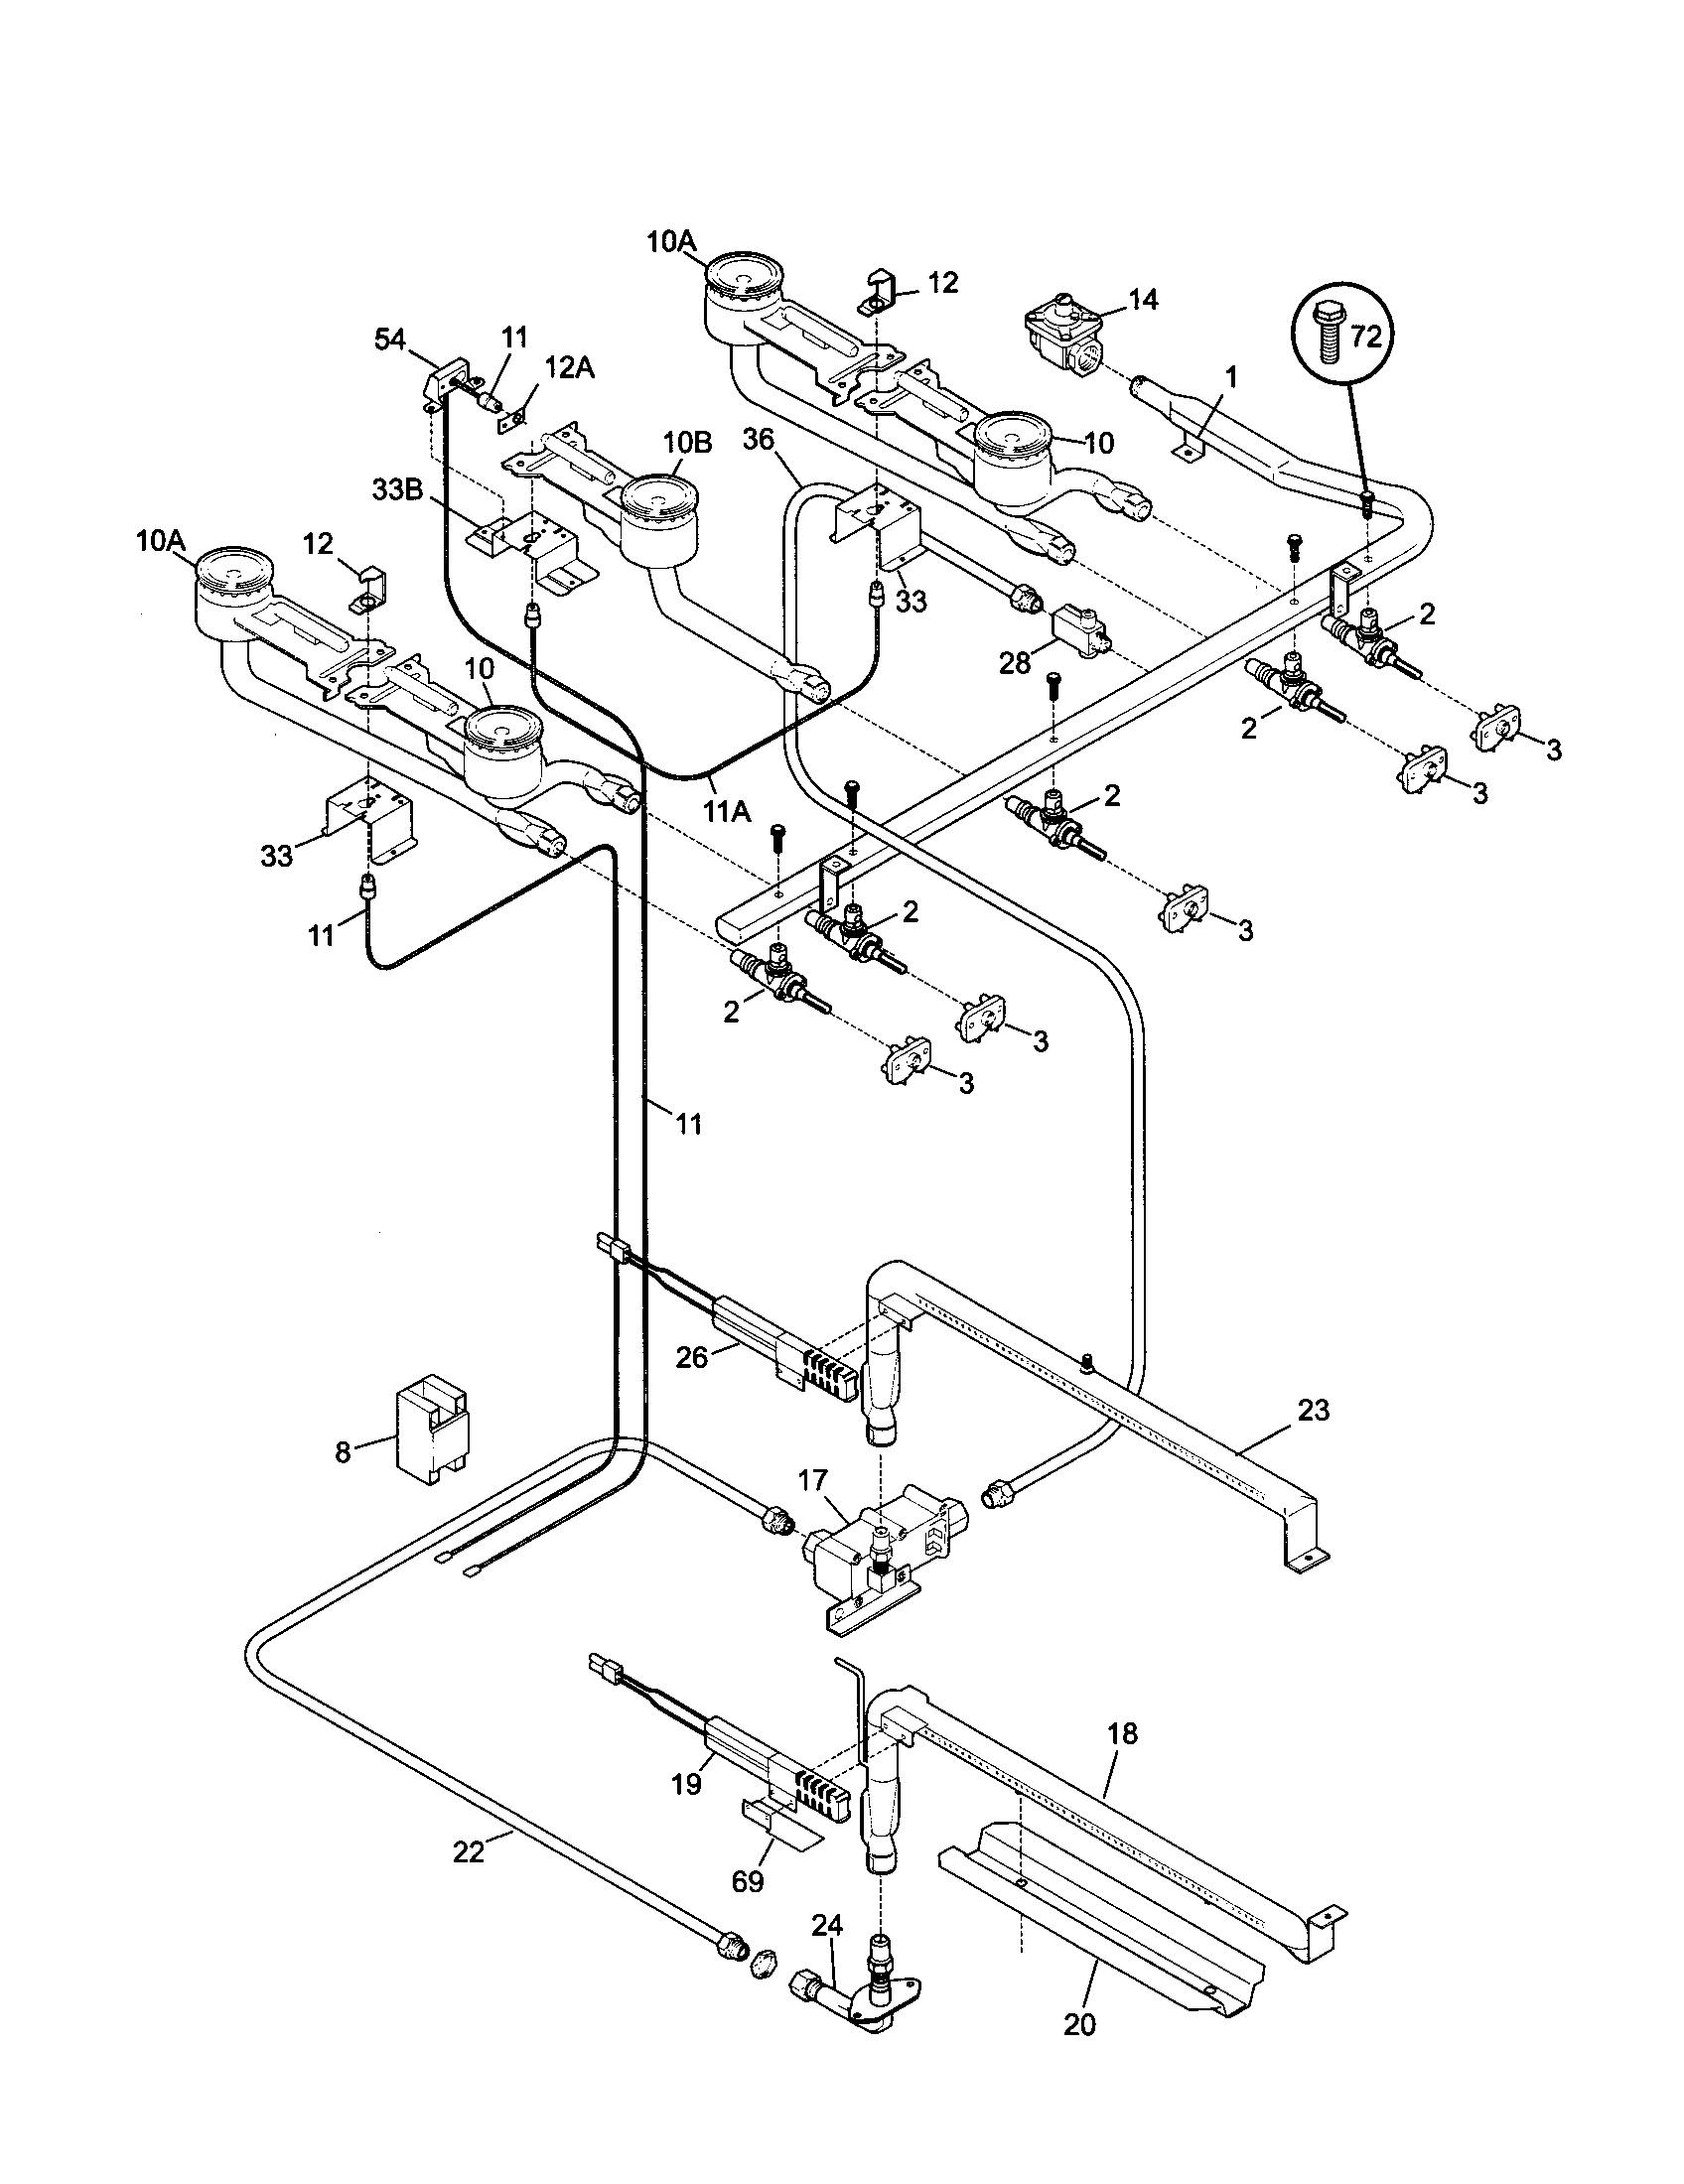 Tappan gas stove 36